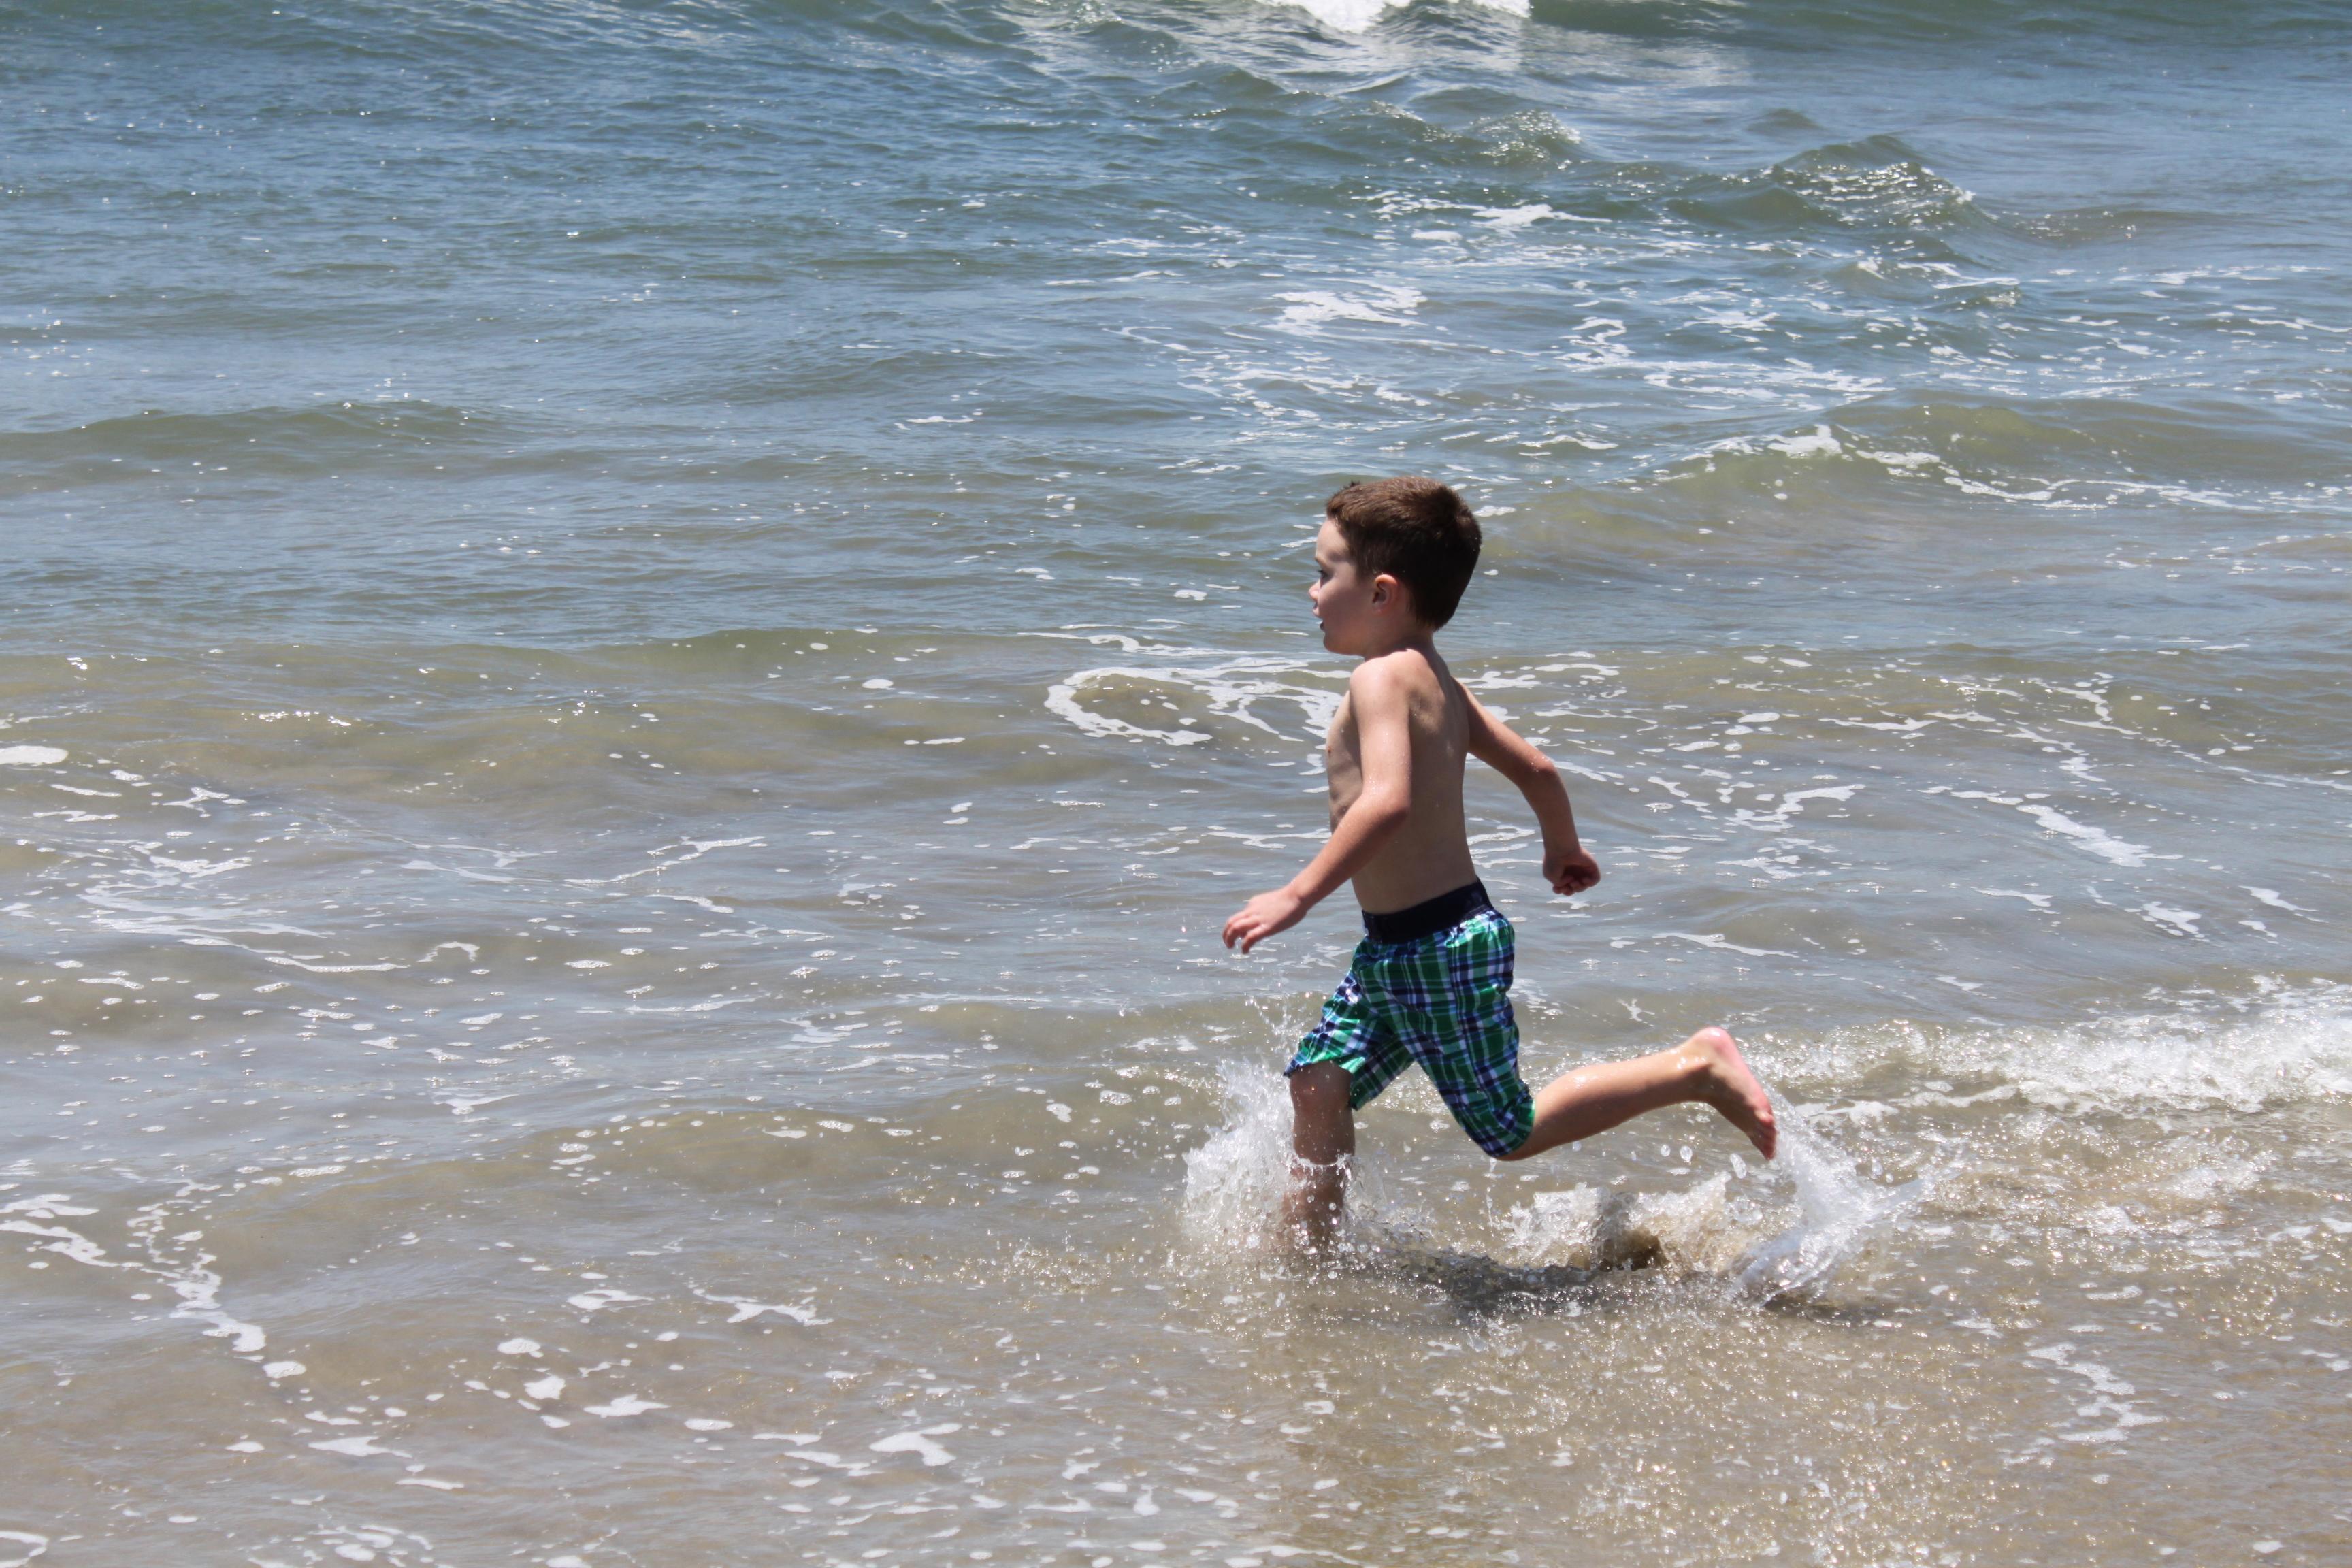 swimmable california day, california coastkeeper